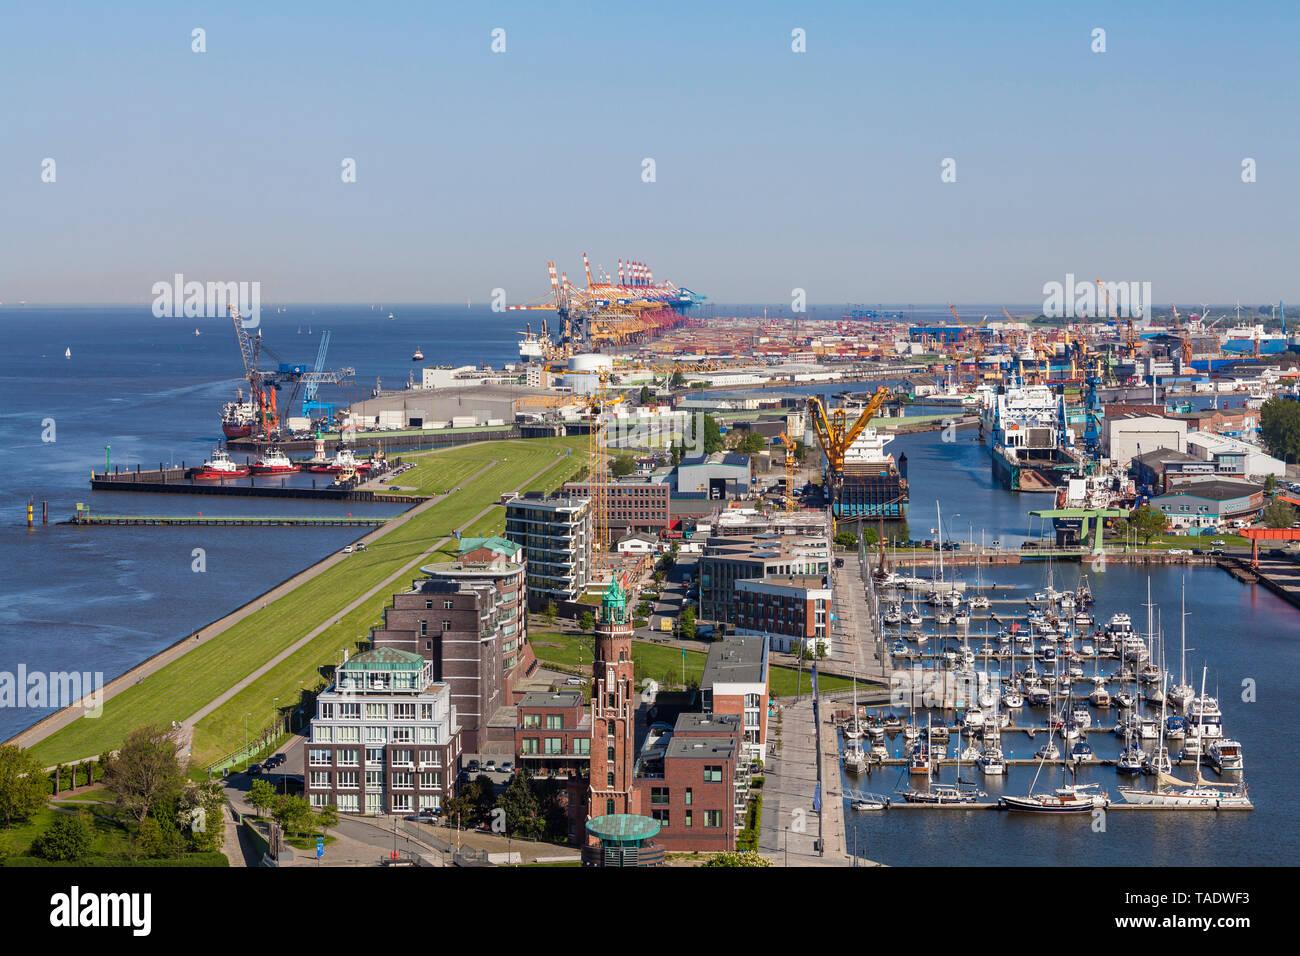 Germany, Bremen, Bremerhaven, New Harbour, Weser dike - Stock Image